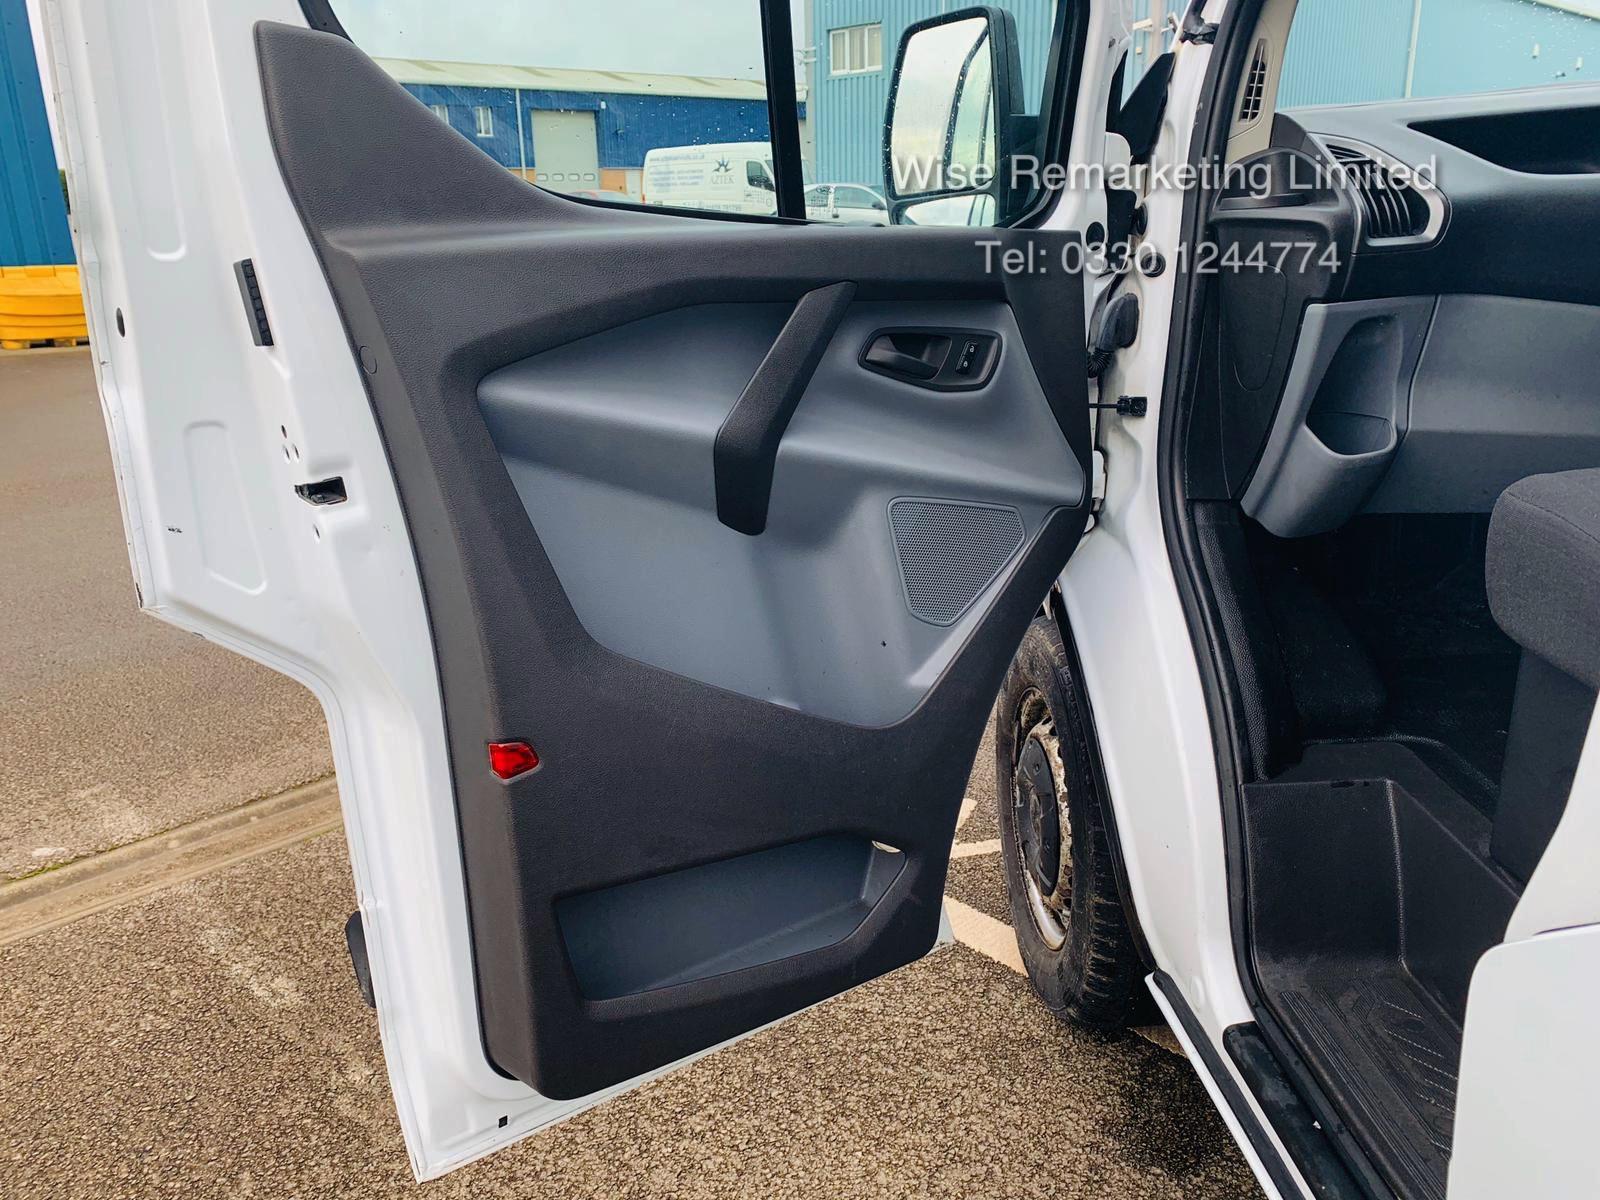 Ford Transit Custom 2.2 TDCI 290 **HIGH ROOF** - 2016 Model - AIR CON- 1 OWNER- FSH- RARE VAN!! - Image 22 of 24